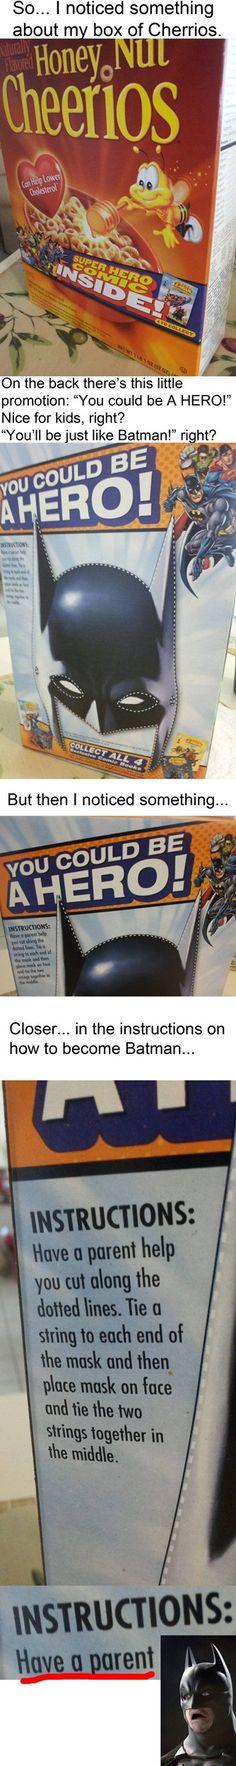 bahahahahaha batman fans get it